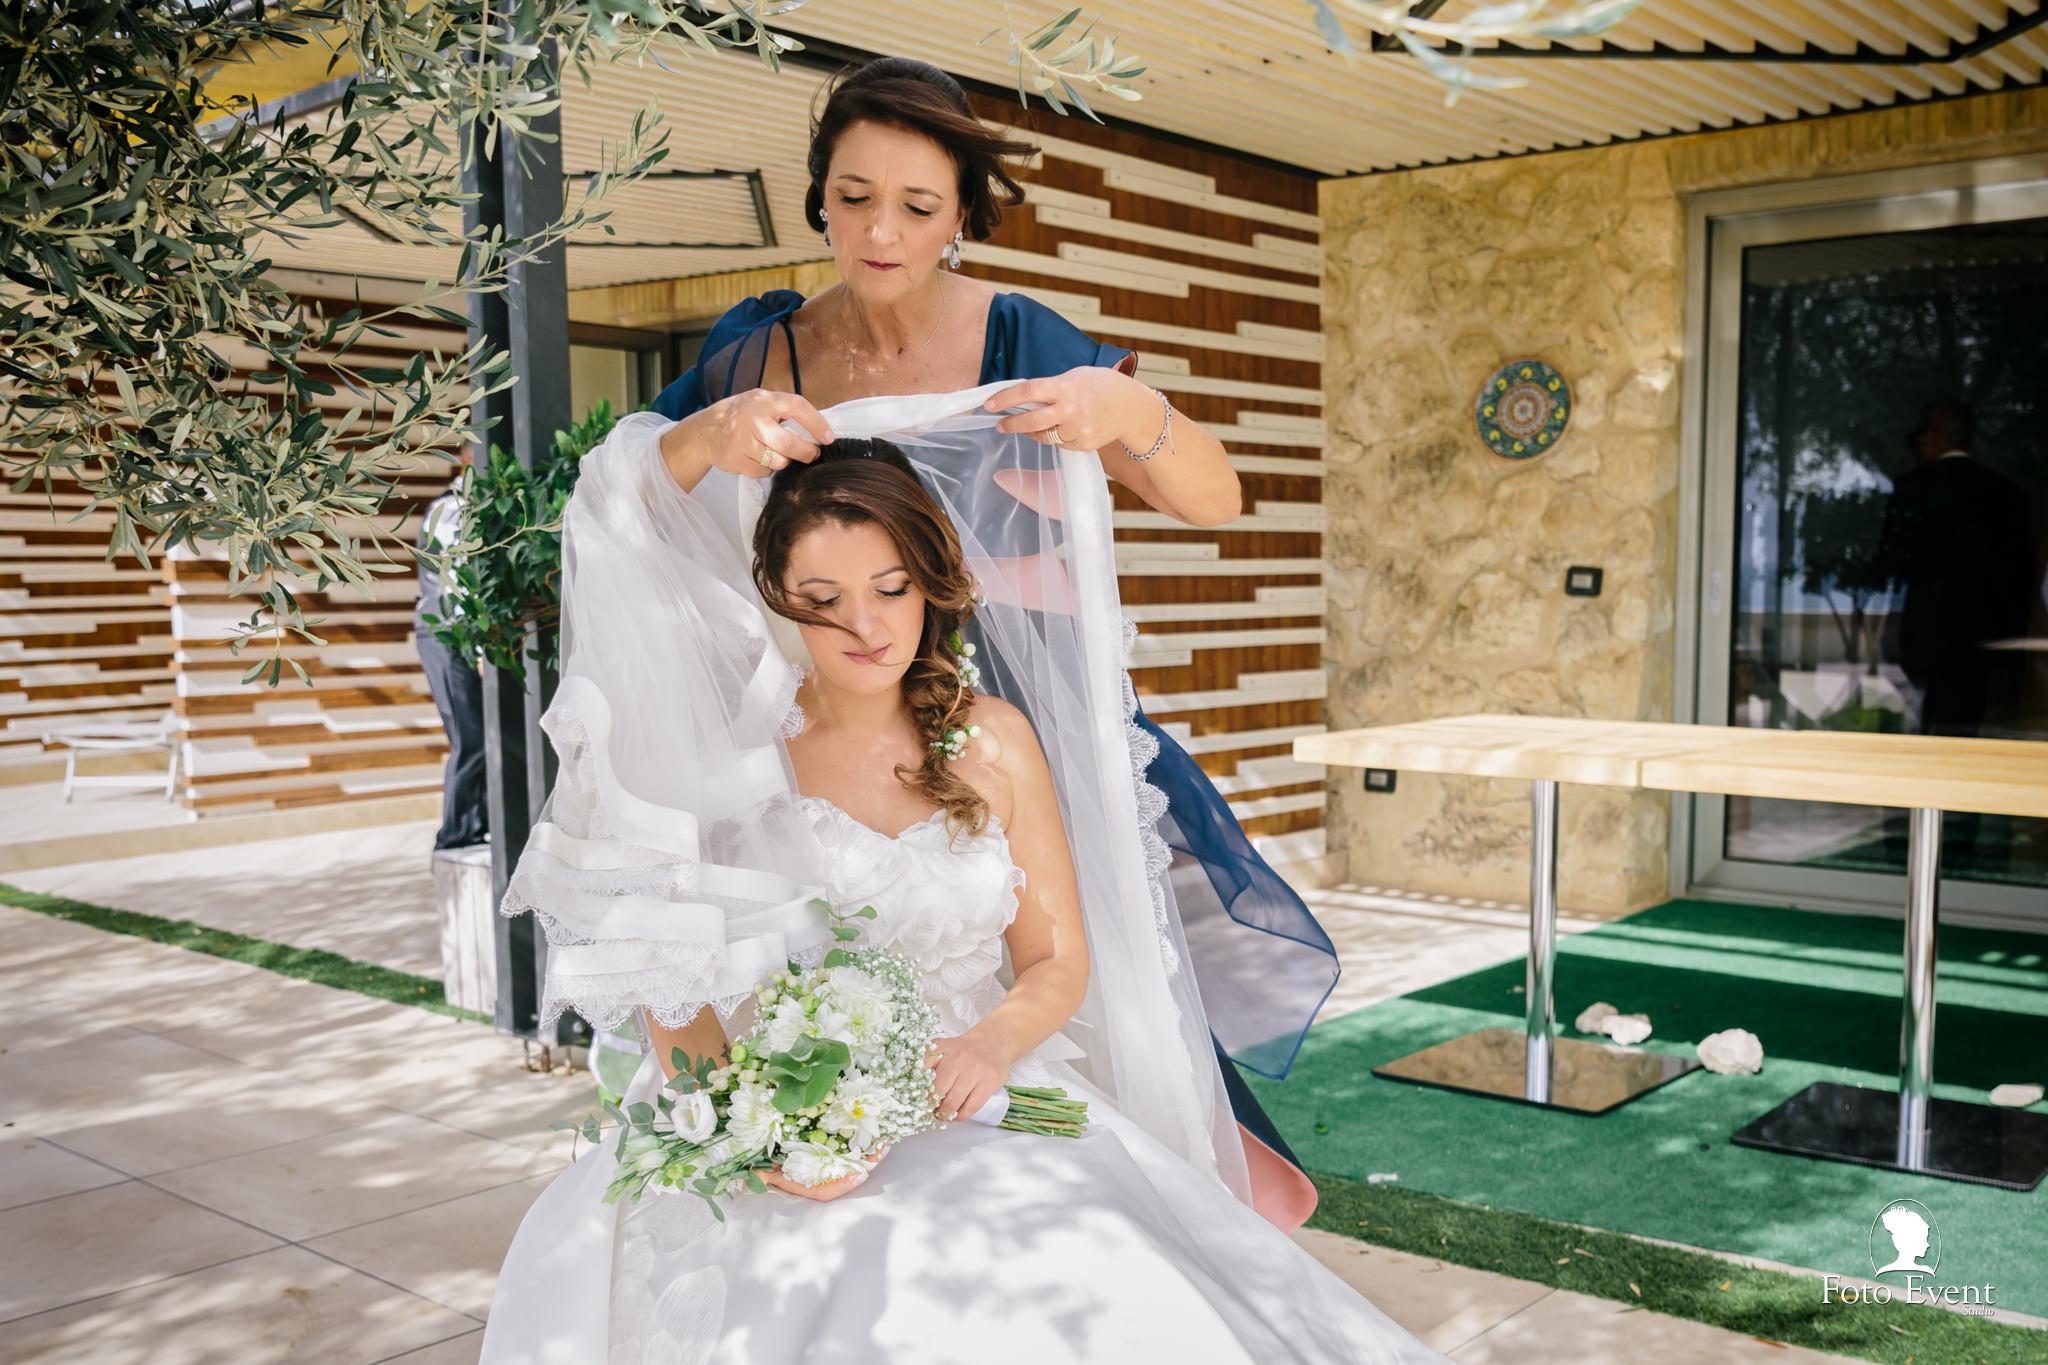 031-2020-10-15-Matrimonio-Noemi-e-Salvatore-Paterno-5DE-1216-Edit